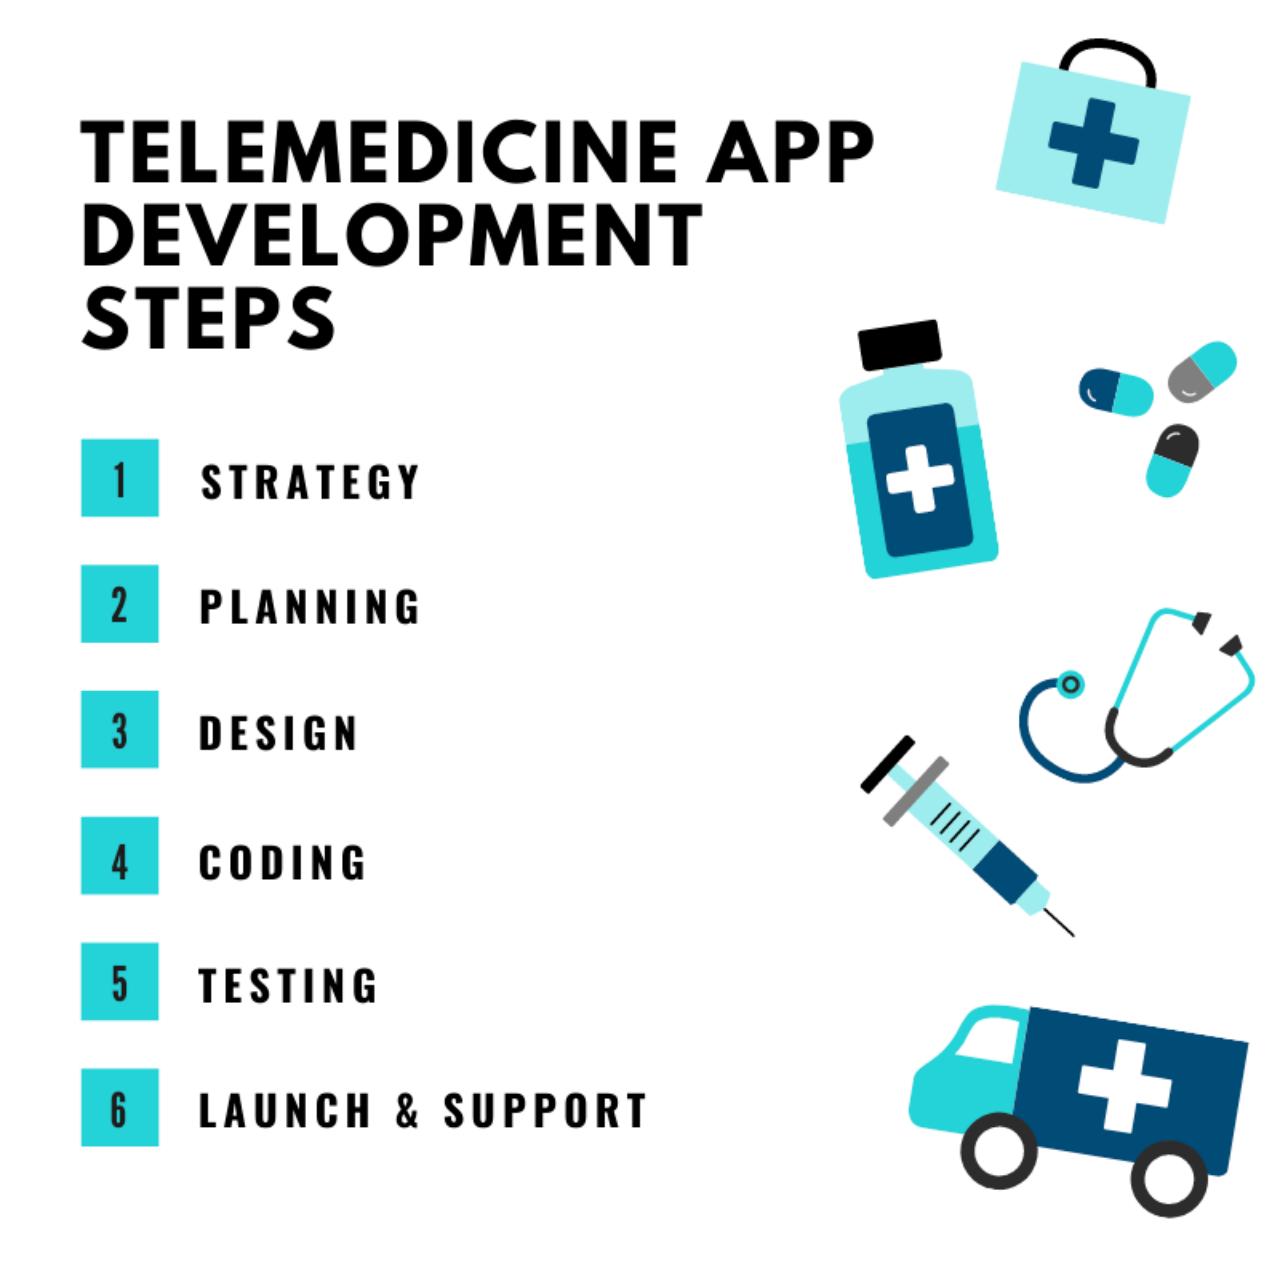 Telemedicine App Development Steps